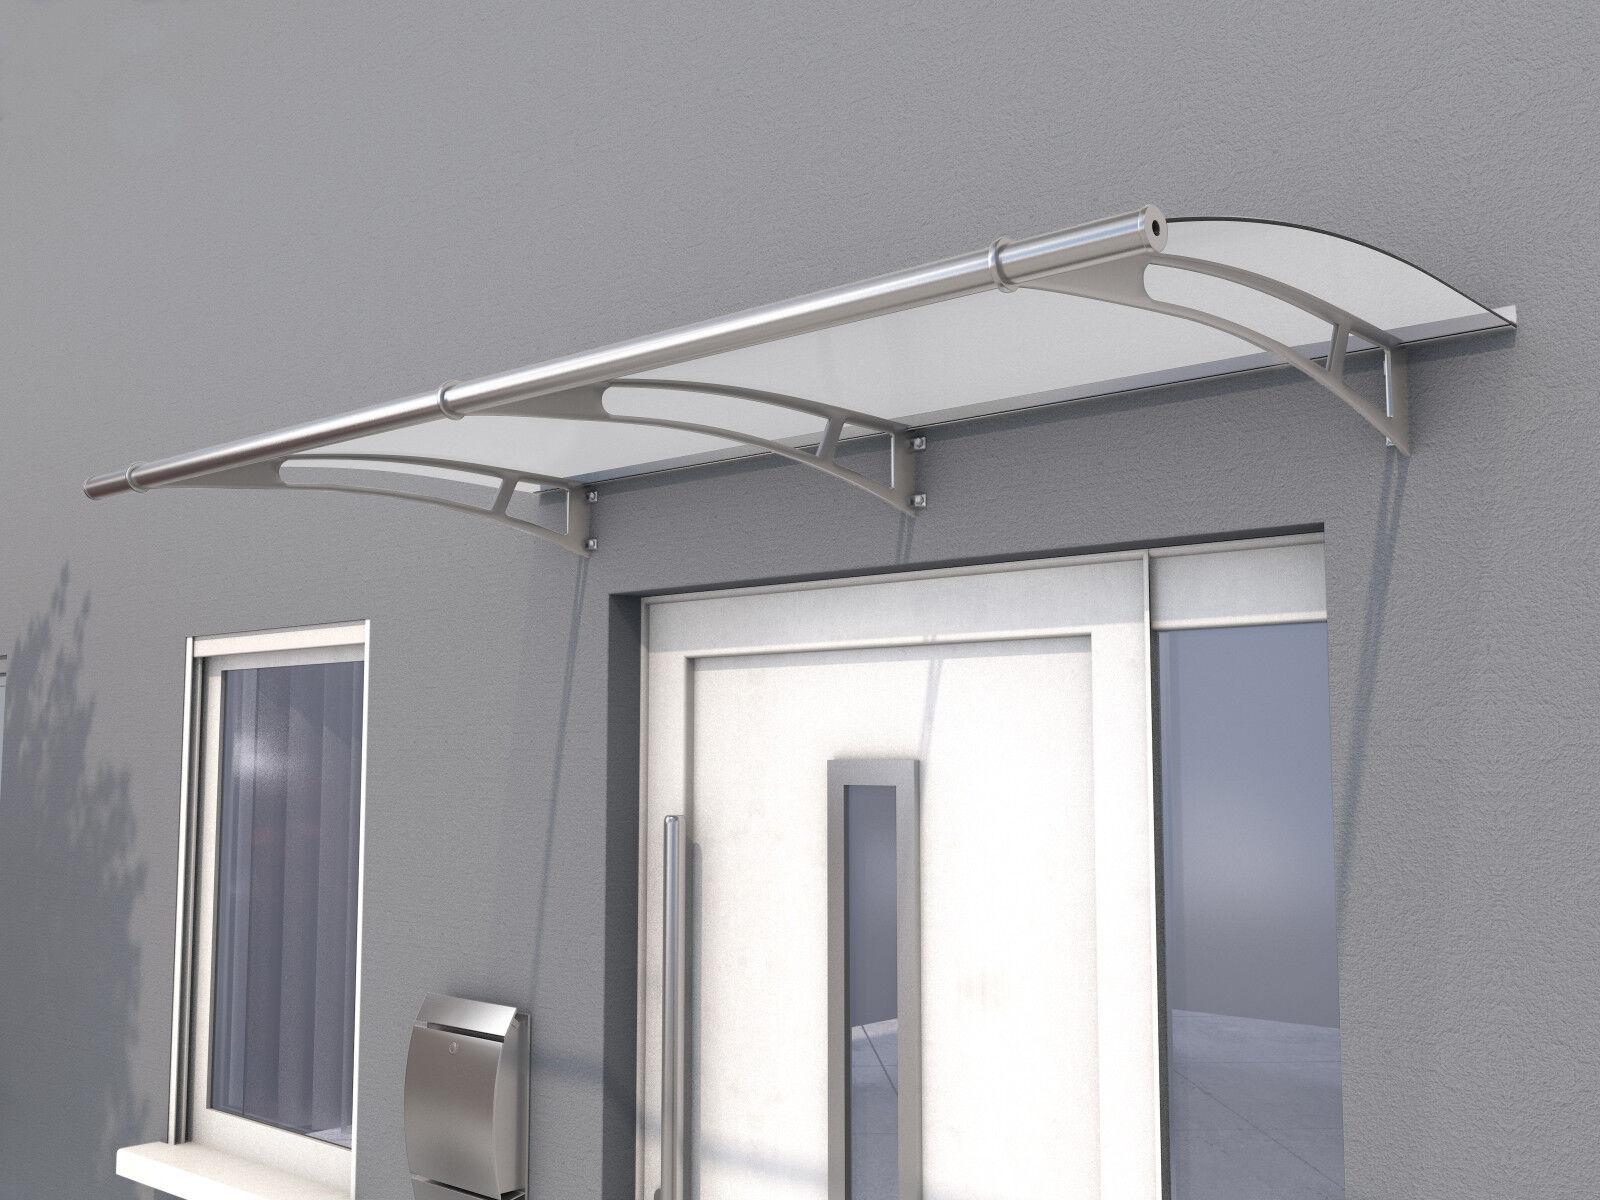 Gutta Pultvordach PT/L 190 satiniert weiß - Haustürvordach 190 x 95 cm Acrylglas